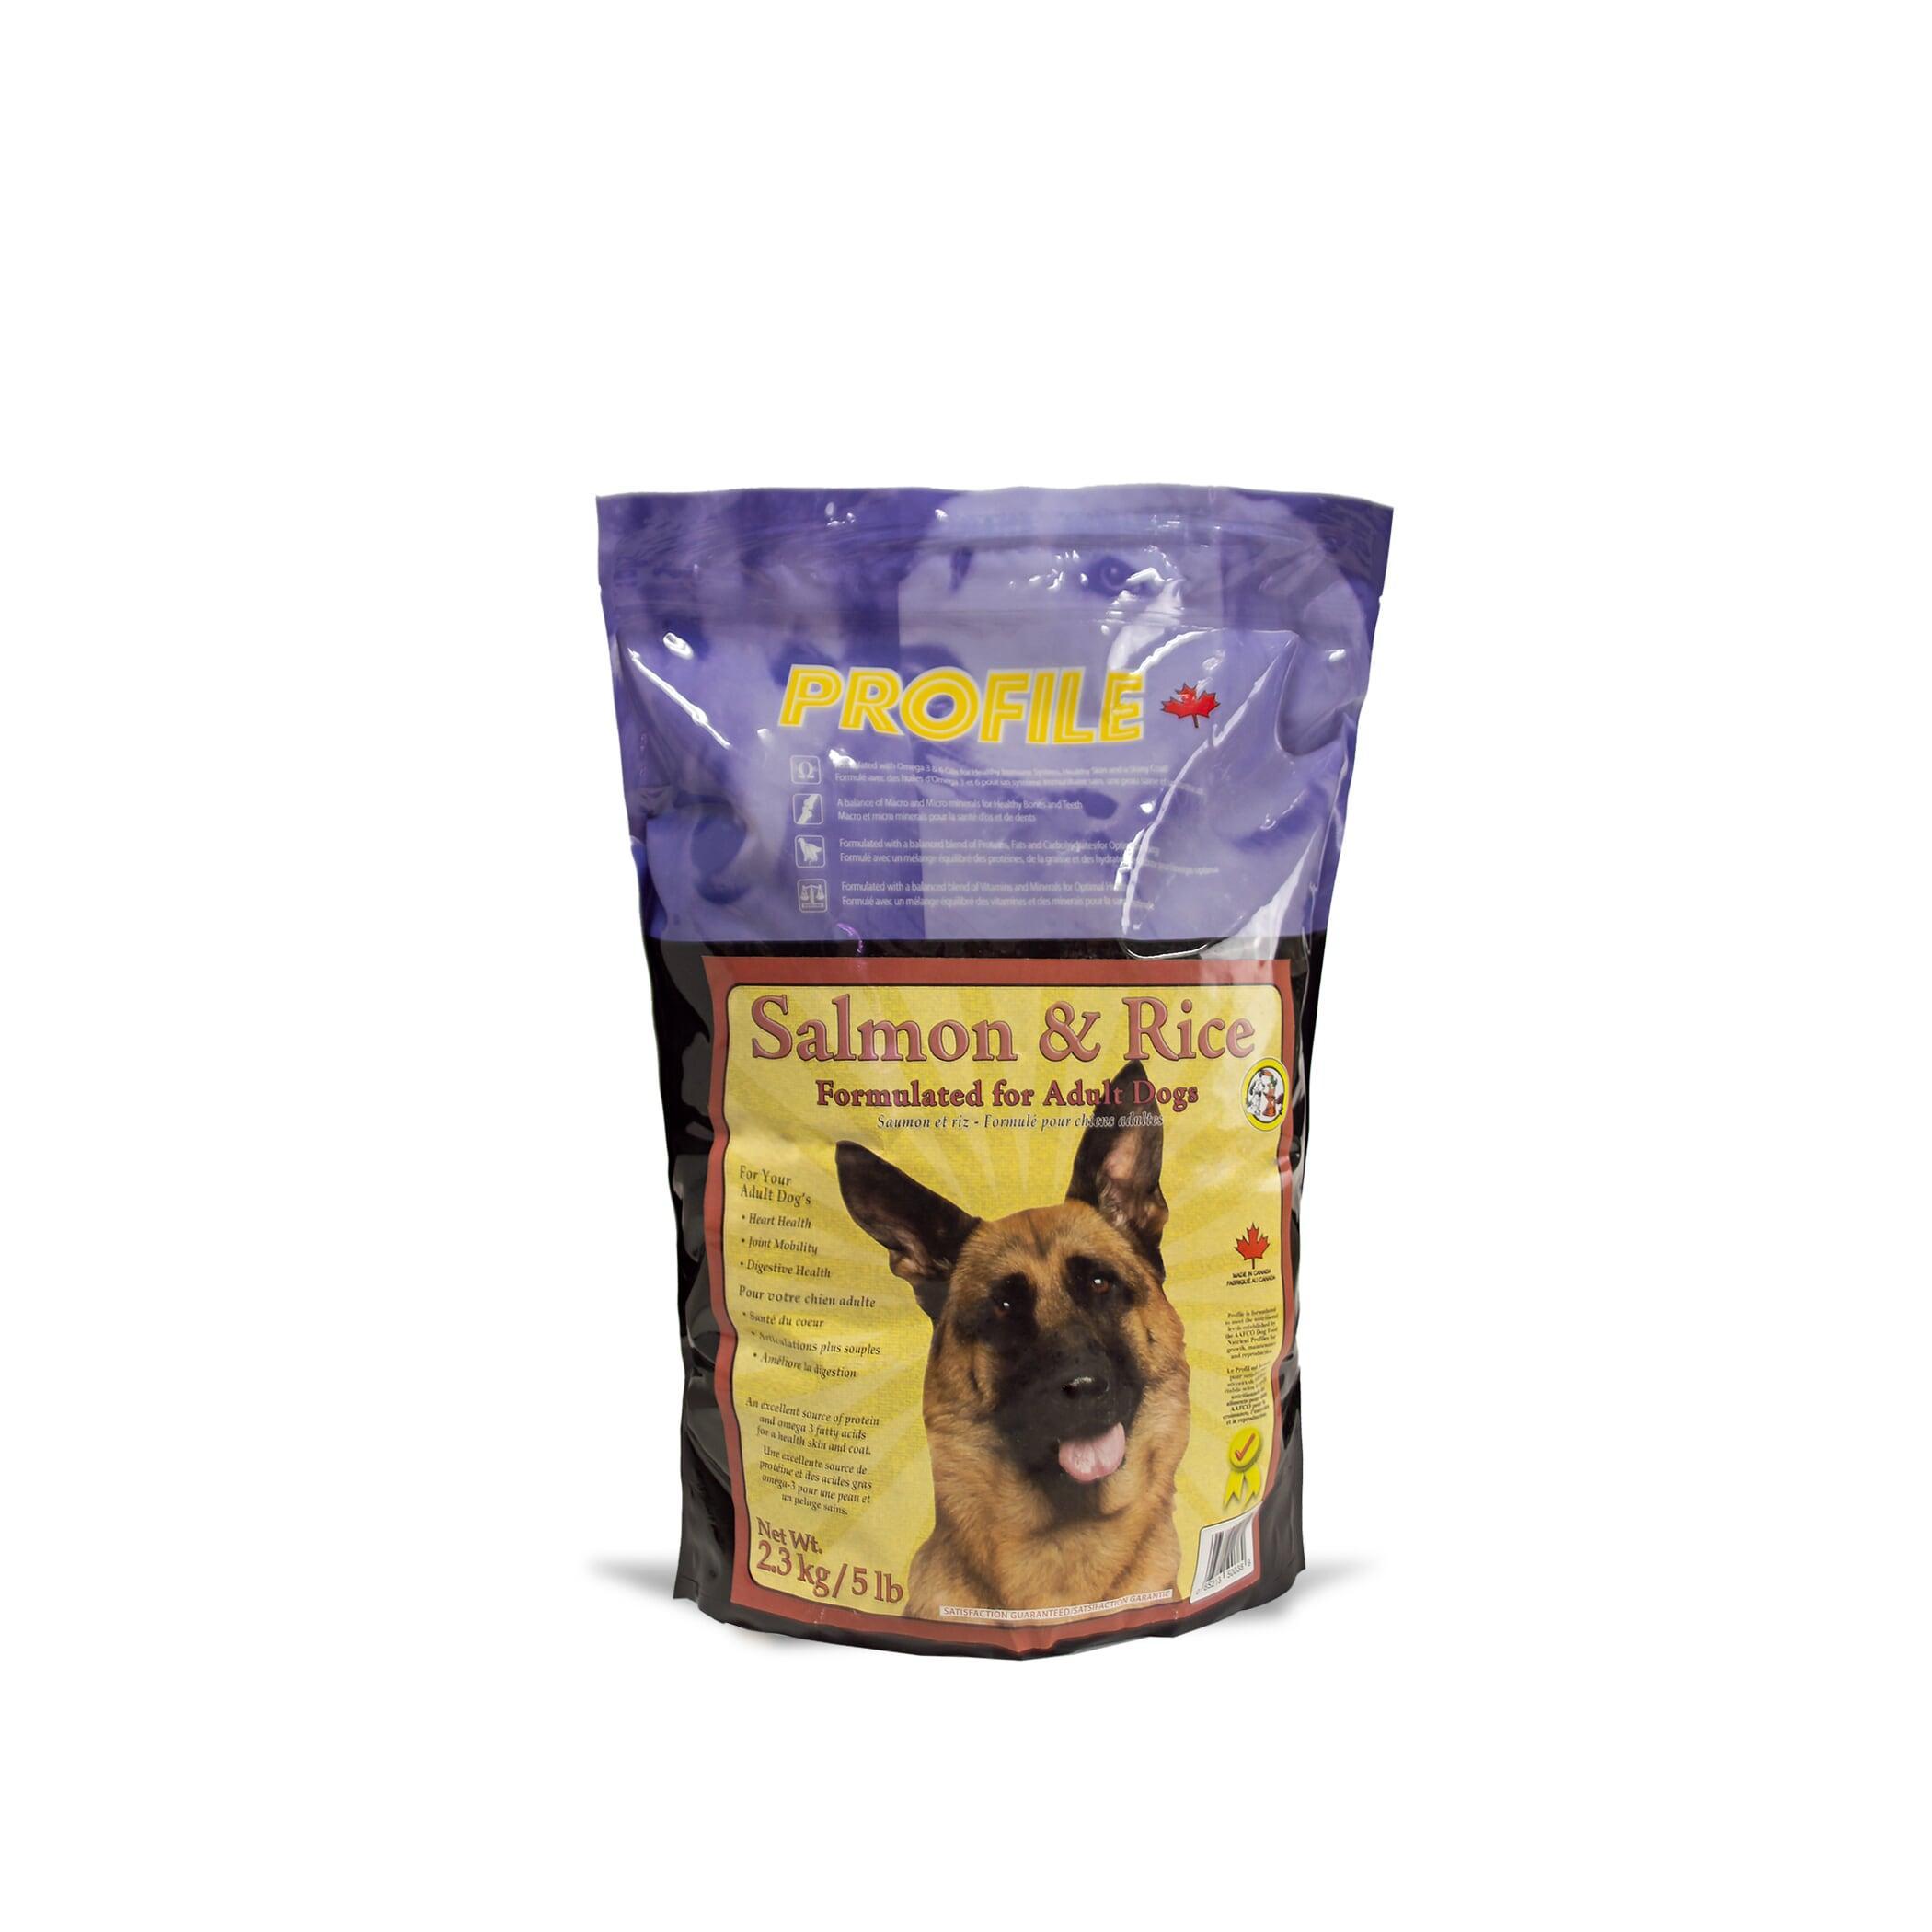 Profile Salmon & Rice Dry Dog Food Image